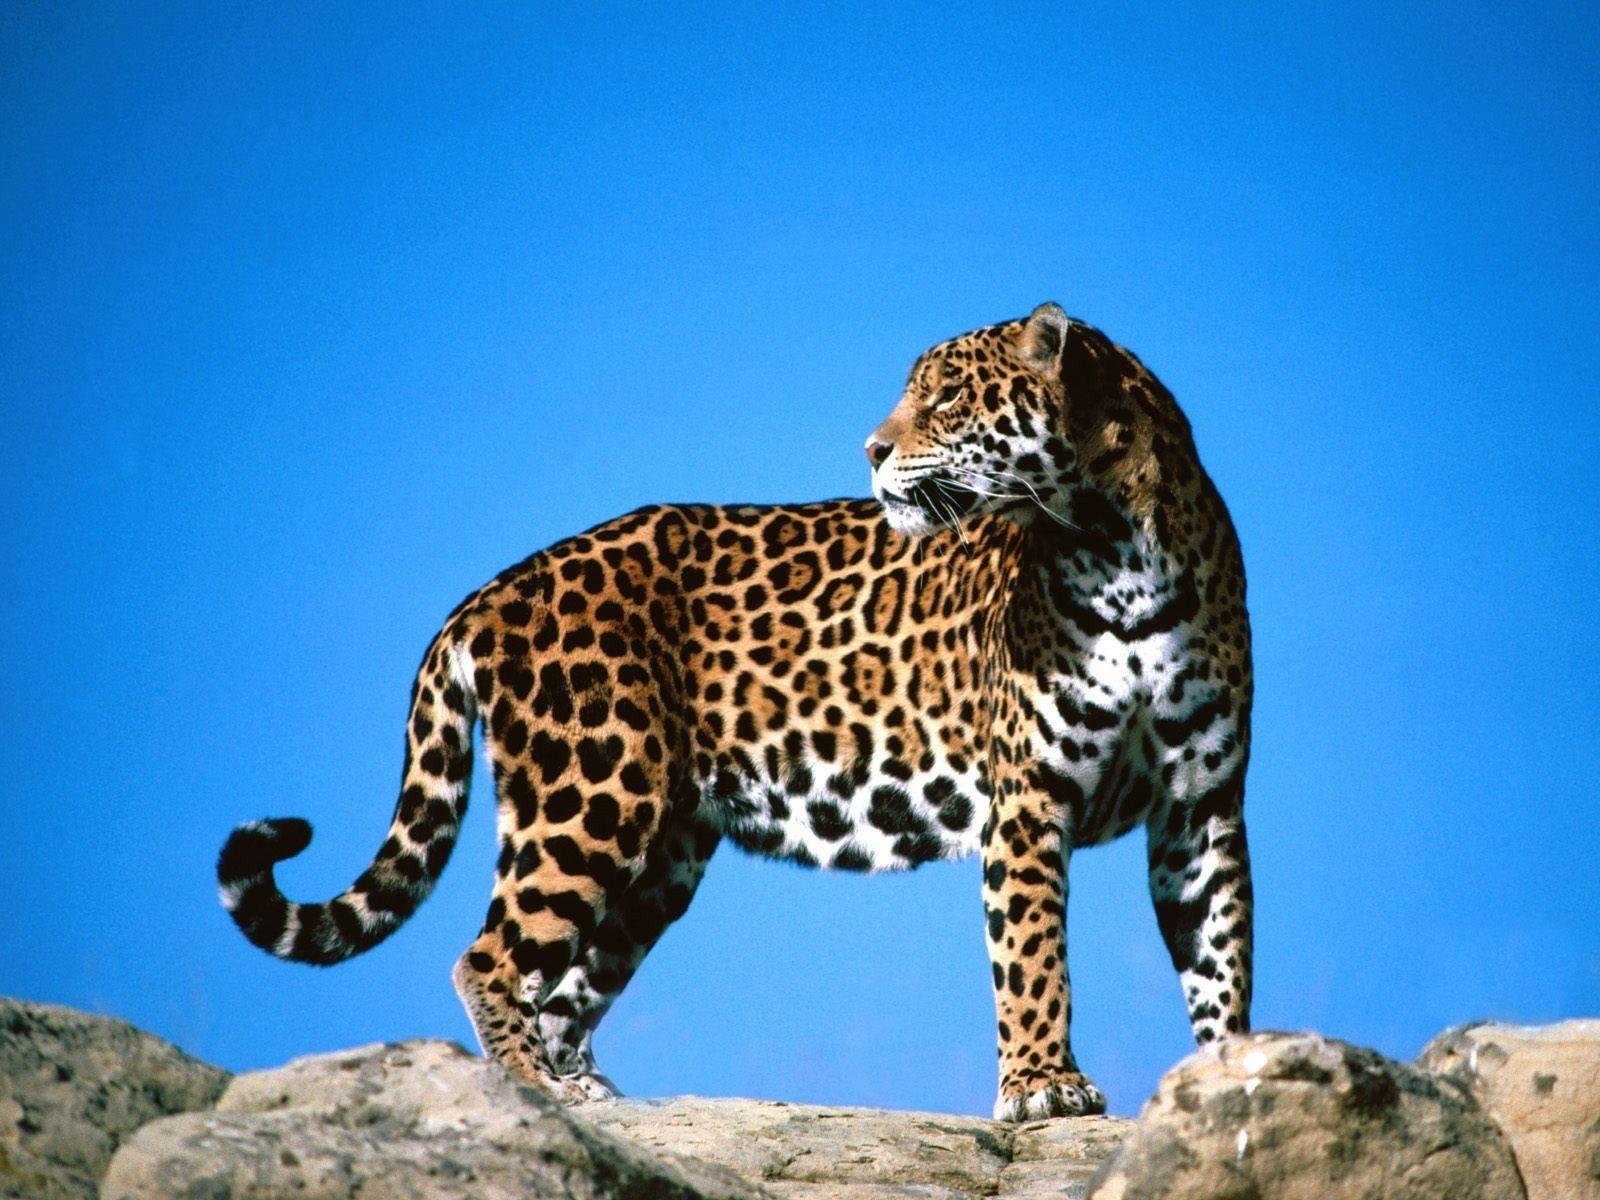 pinluka evlampimums on jaguar | pinterest